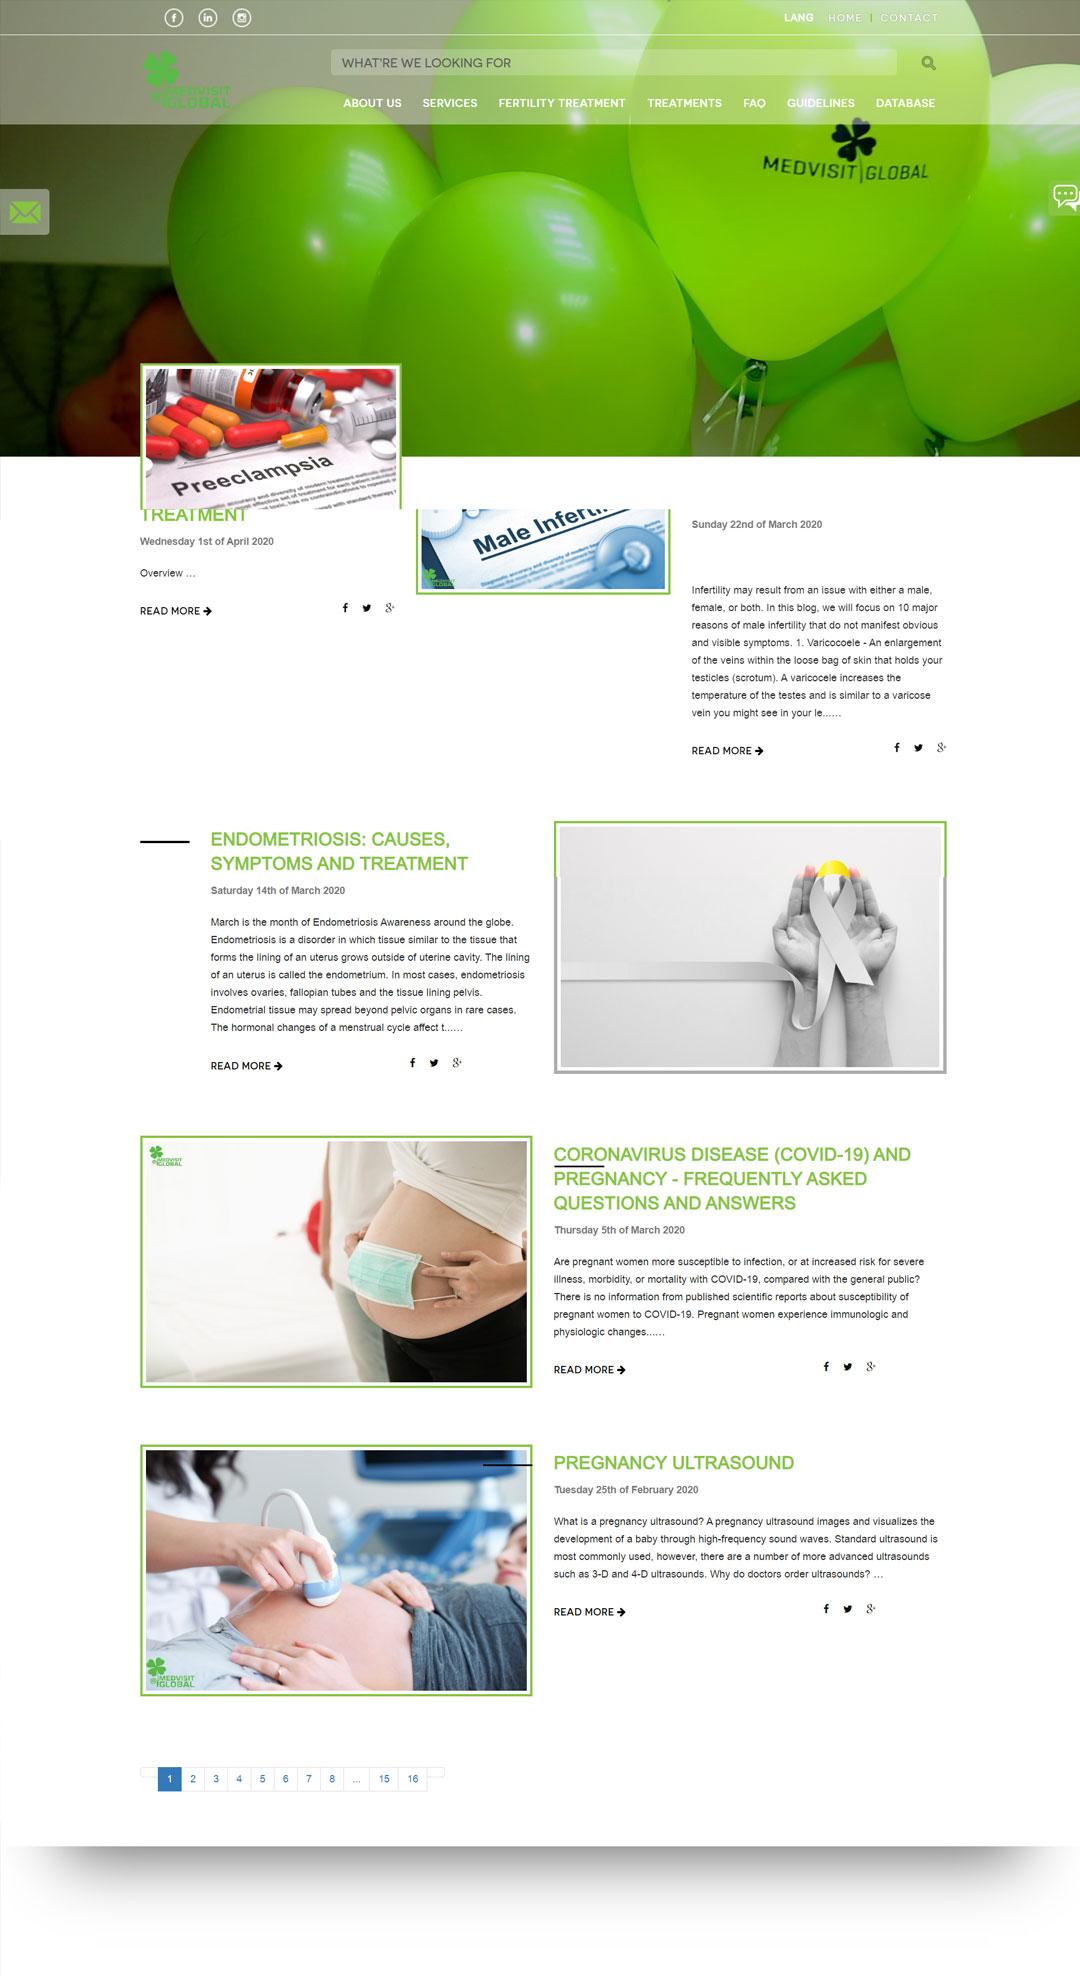 Medvisitglobal.com